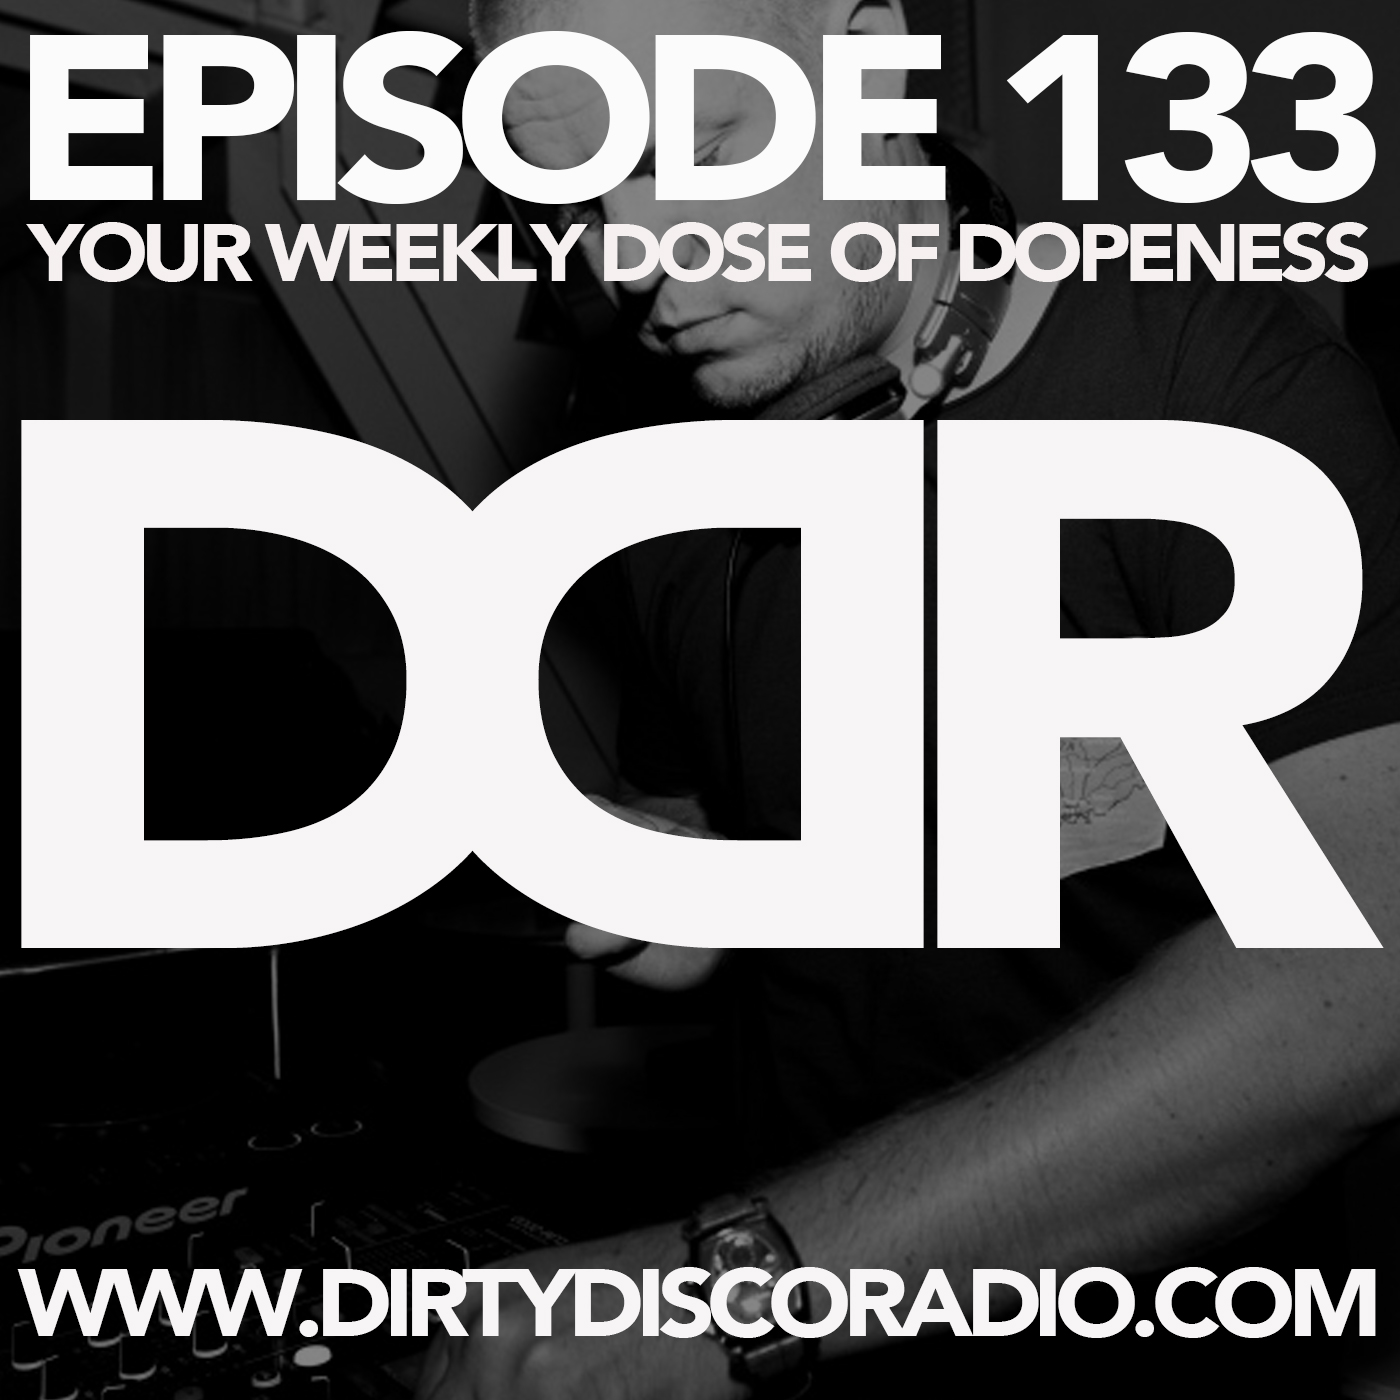 dirty disco radio 133